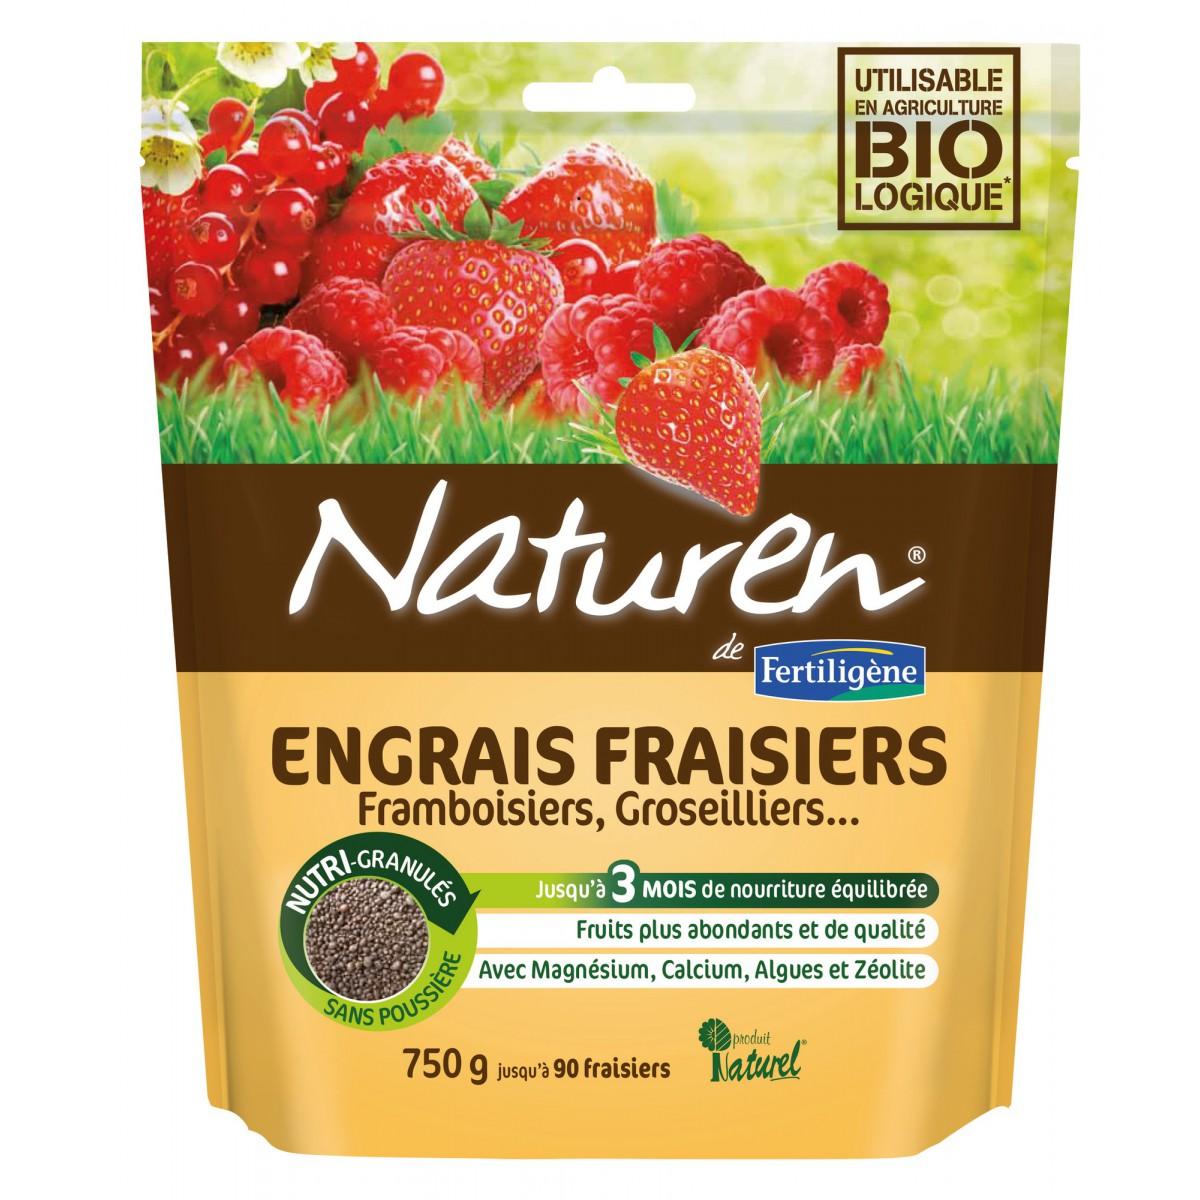 Engrais fraisiers Naturen